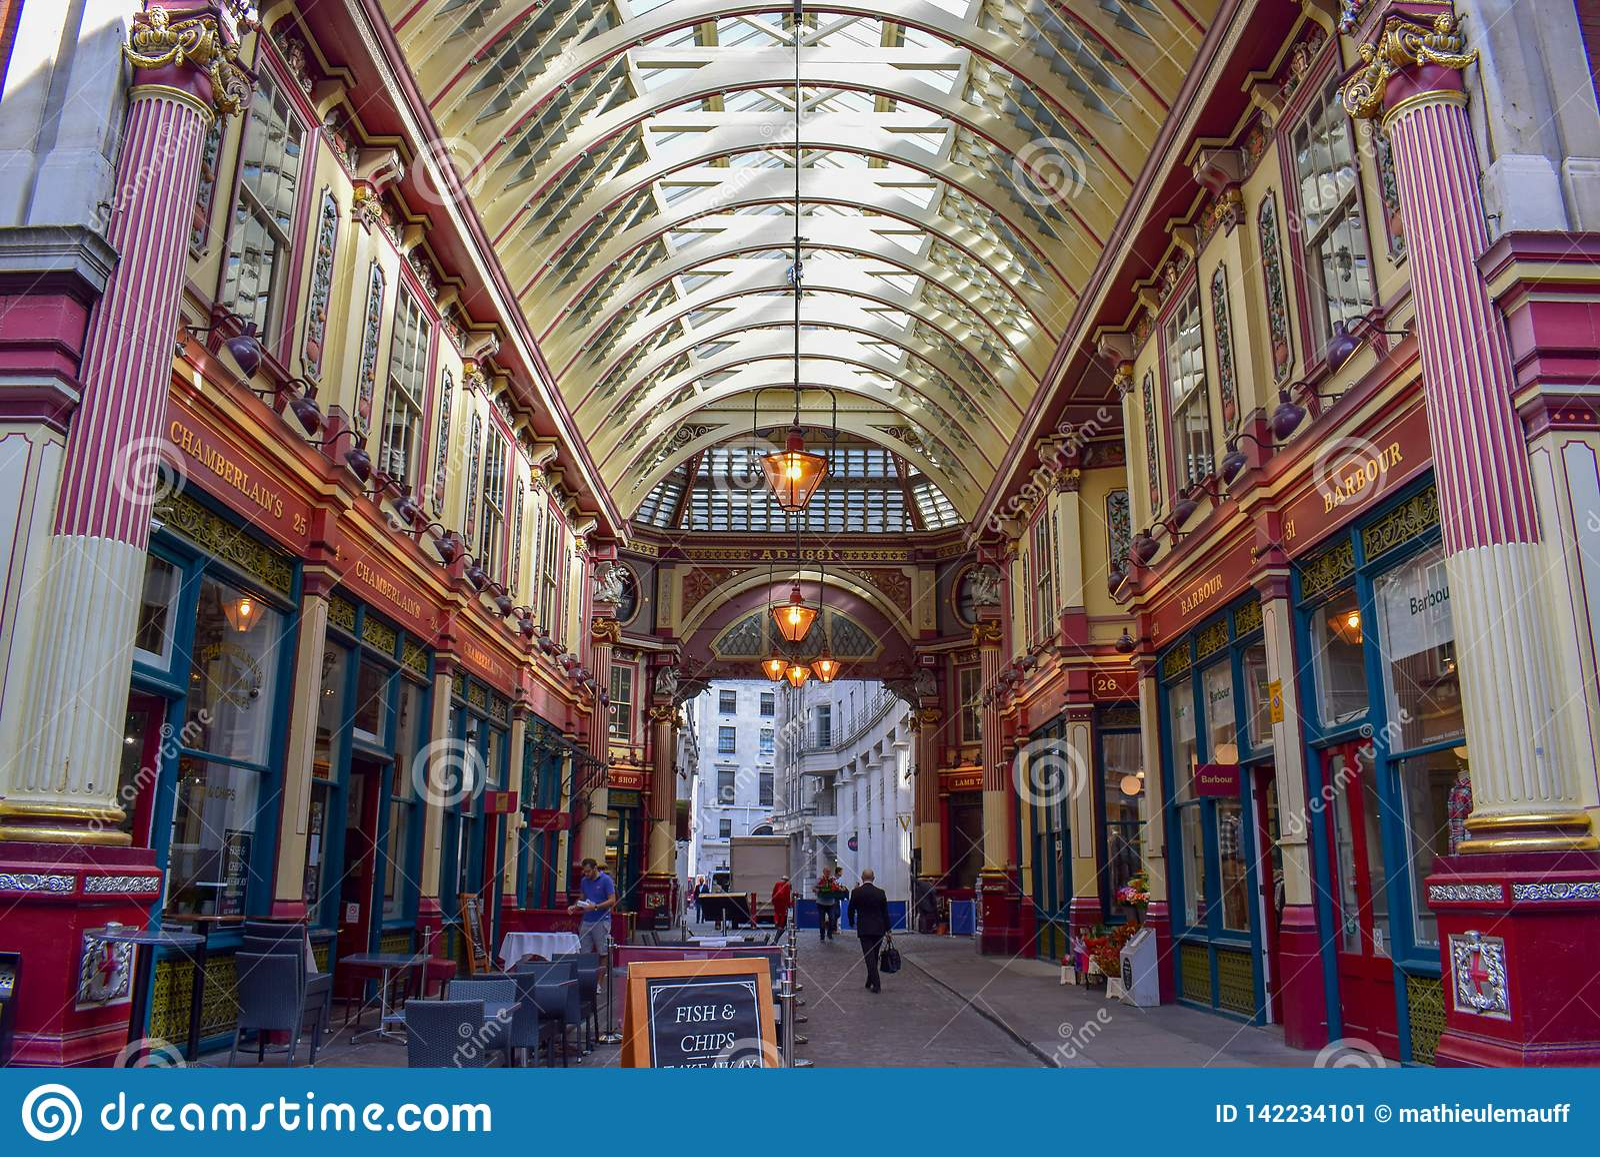 Inside Leadenhall Market on Gracechurch Street in London, England